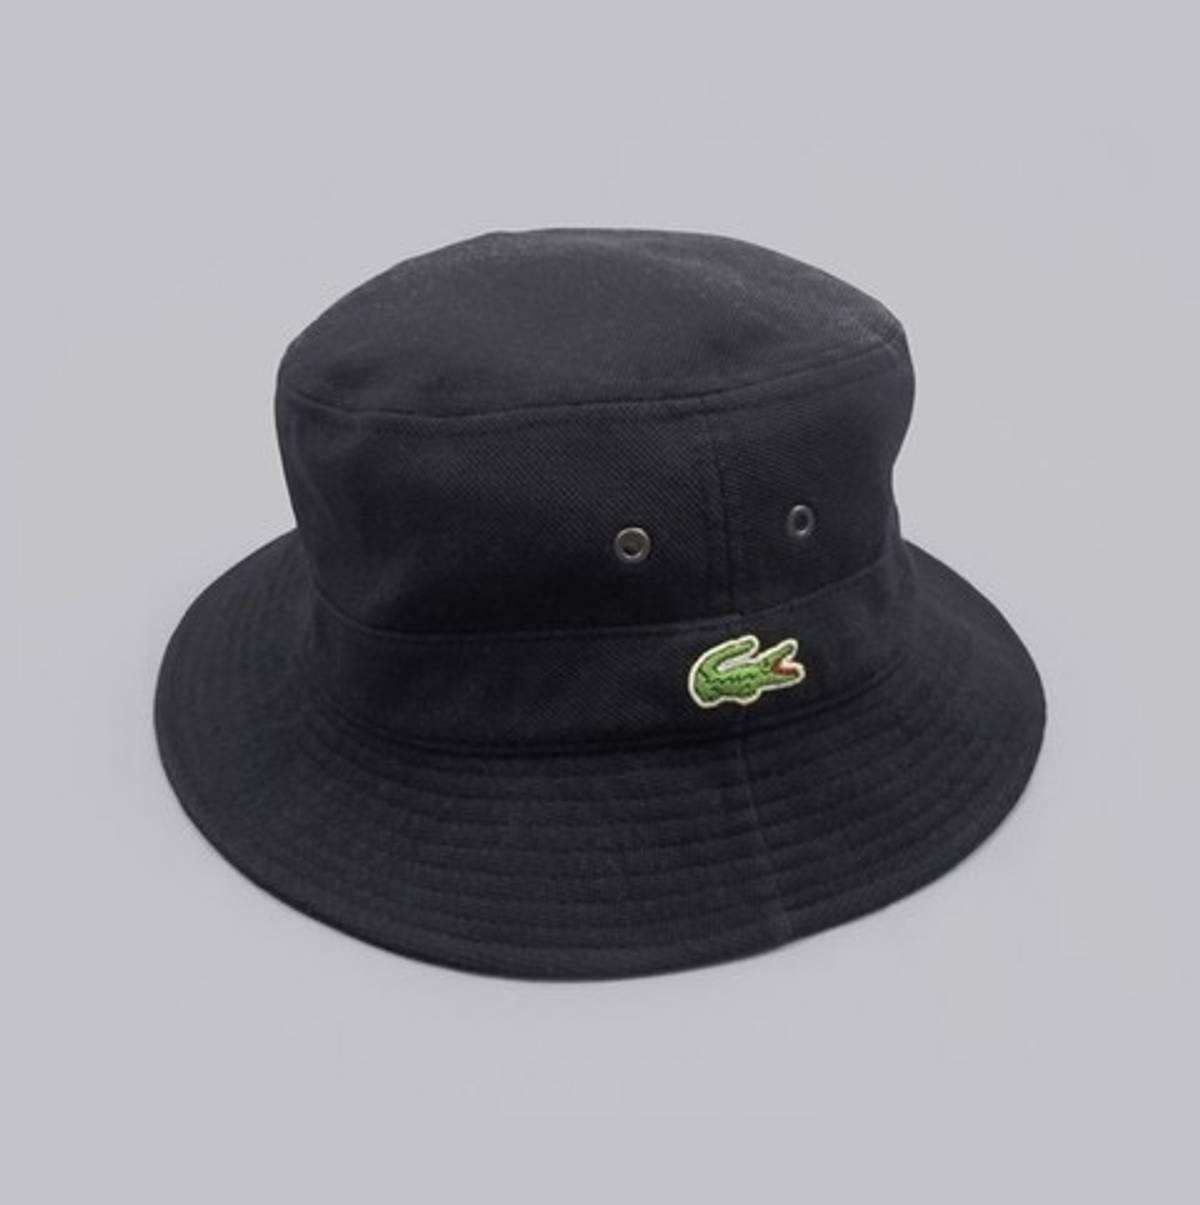 3d57550287d9ee Vintage × Lacoste ×. 90's Lacoste Bucket Hat